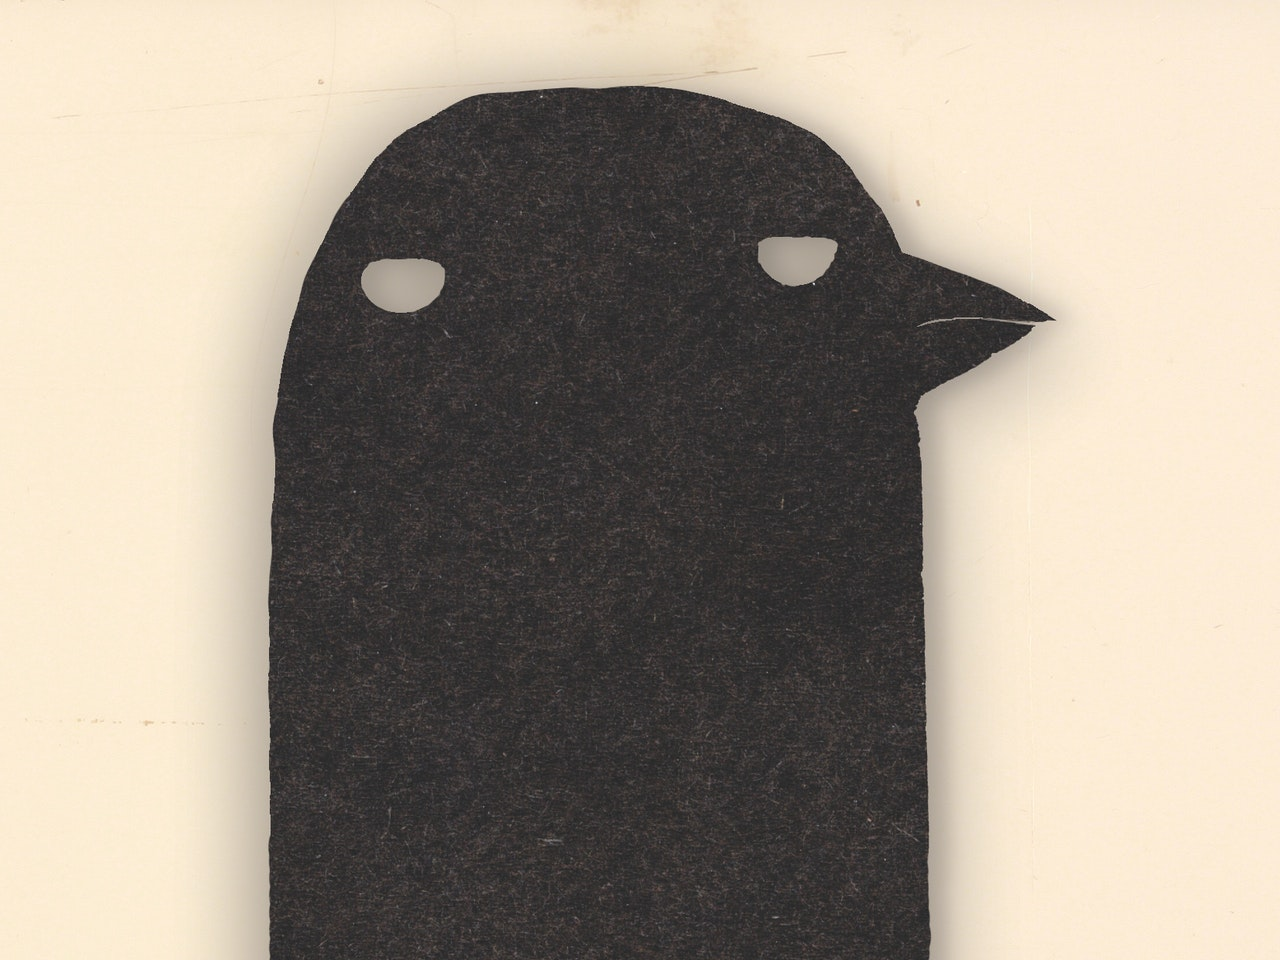 The Making of Longbird